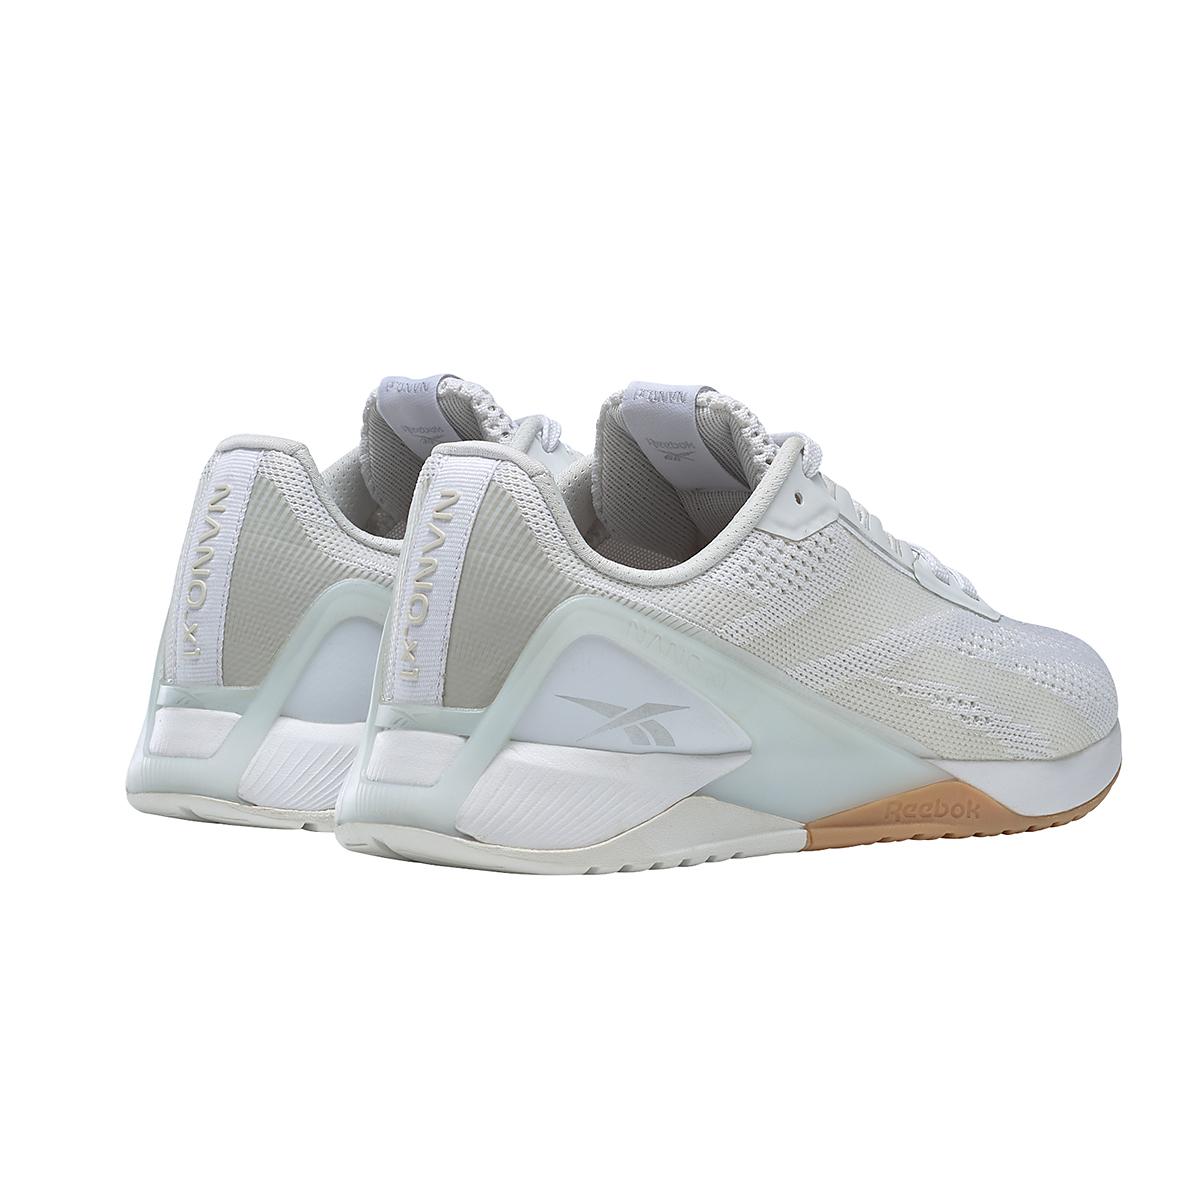 Women's Reebok Nano X1 Training Shoe - Color: White/True Grey/Rubber Gum - Size: 5 - Width: Regular, White/True Grey/Rubber Gum, large, image 4